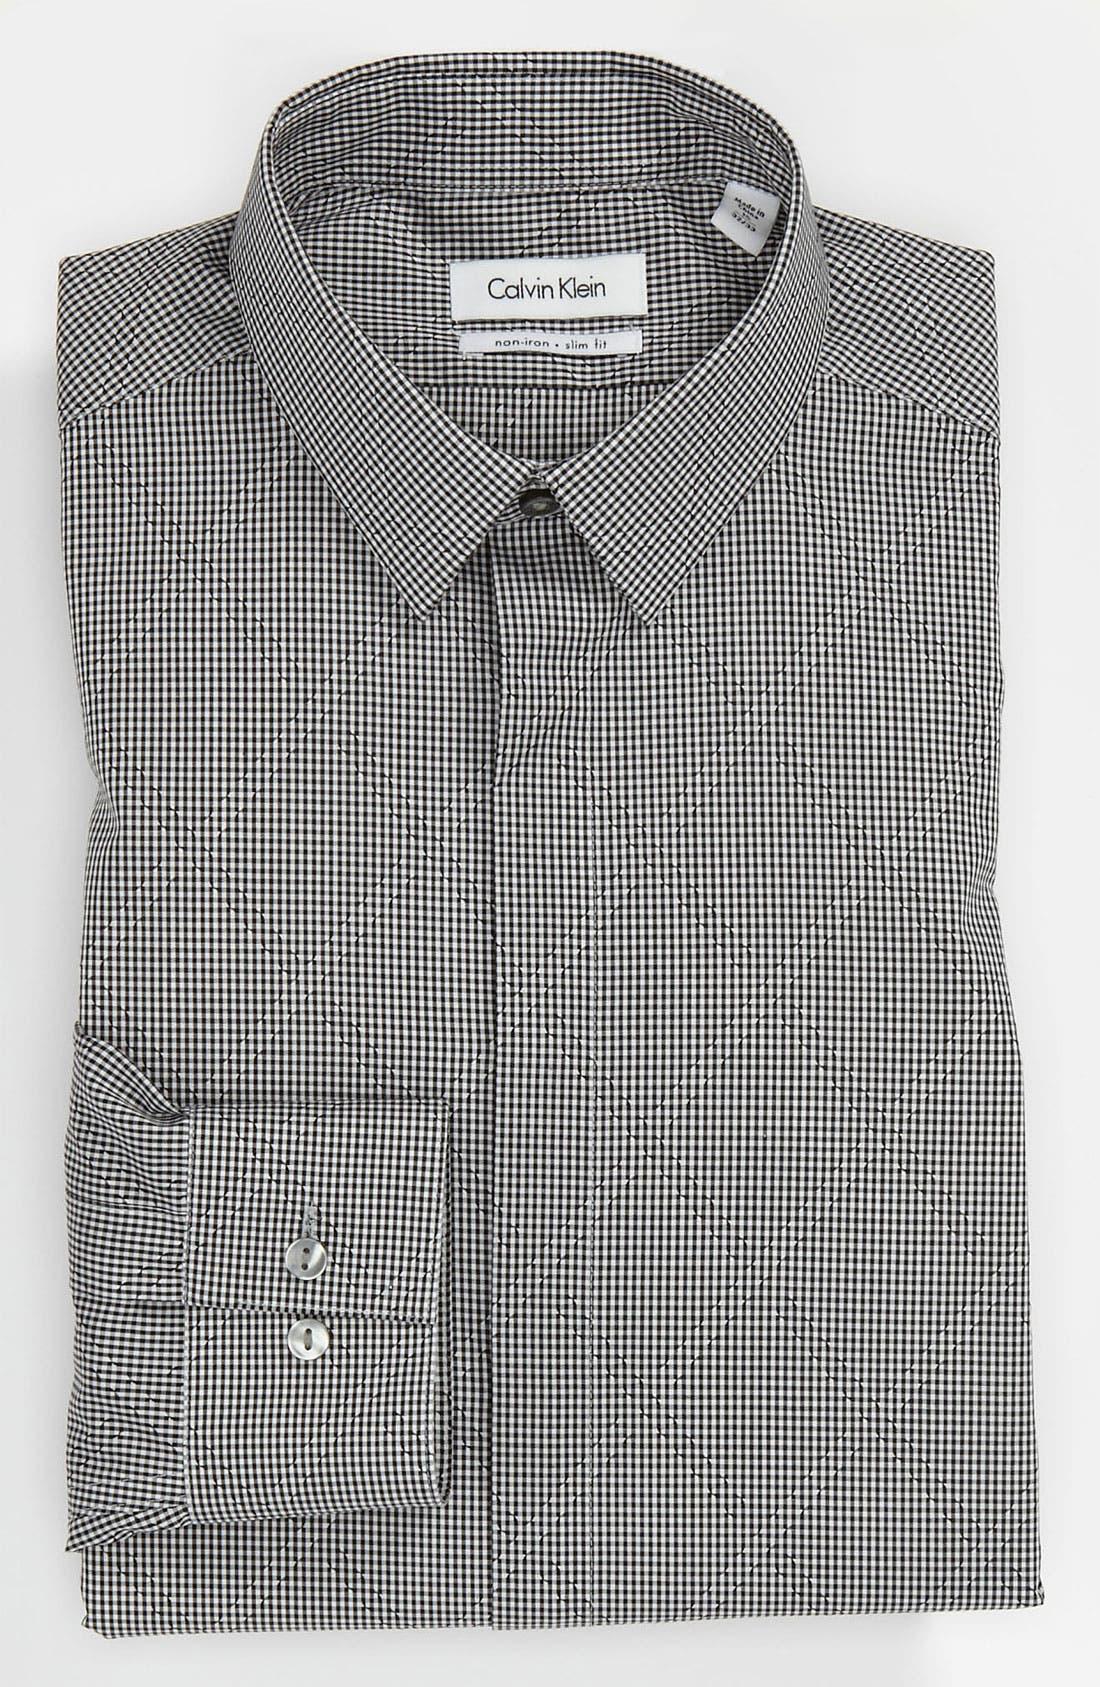 Alternate Image 1 Selected - Calvin Klein 'Como Check' Slim Fit Dress Shirt